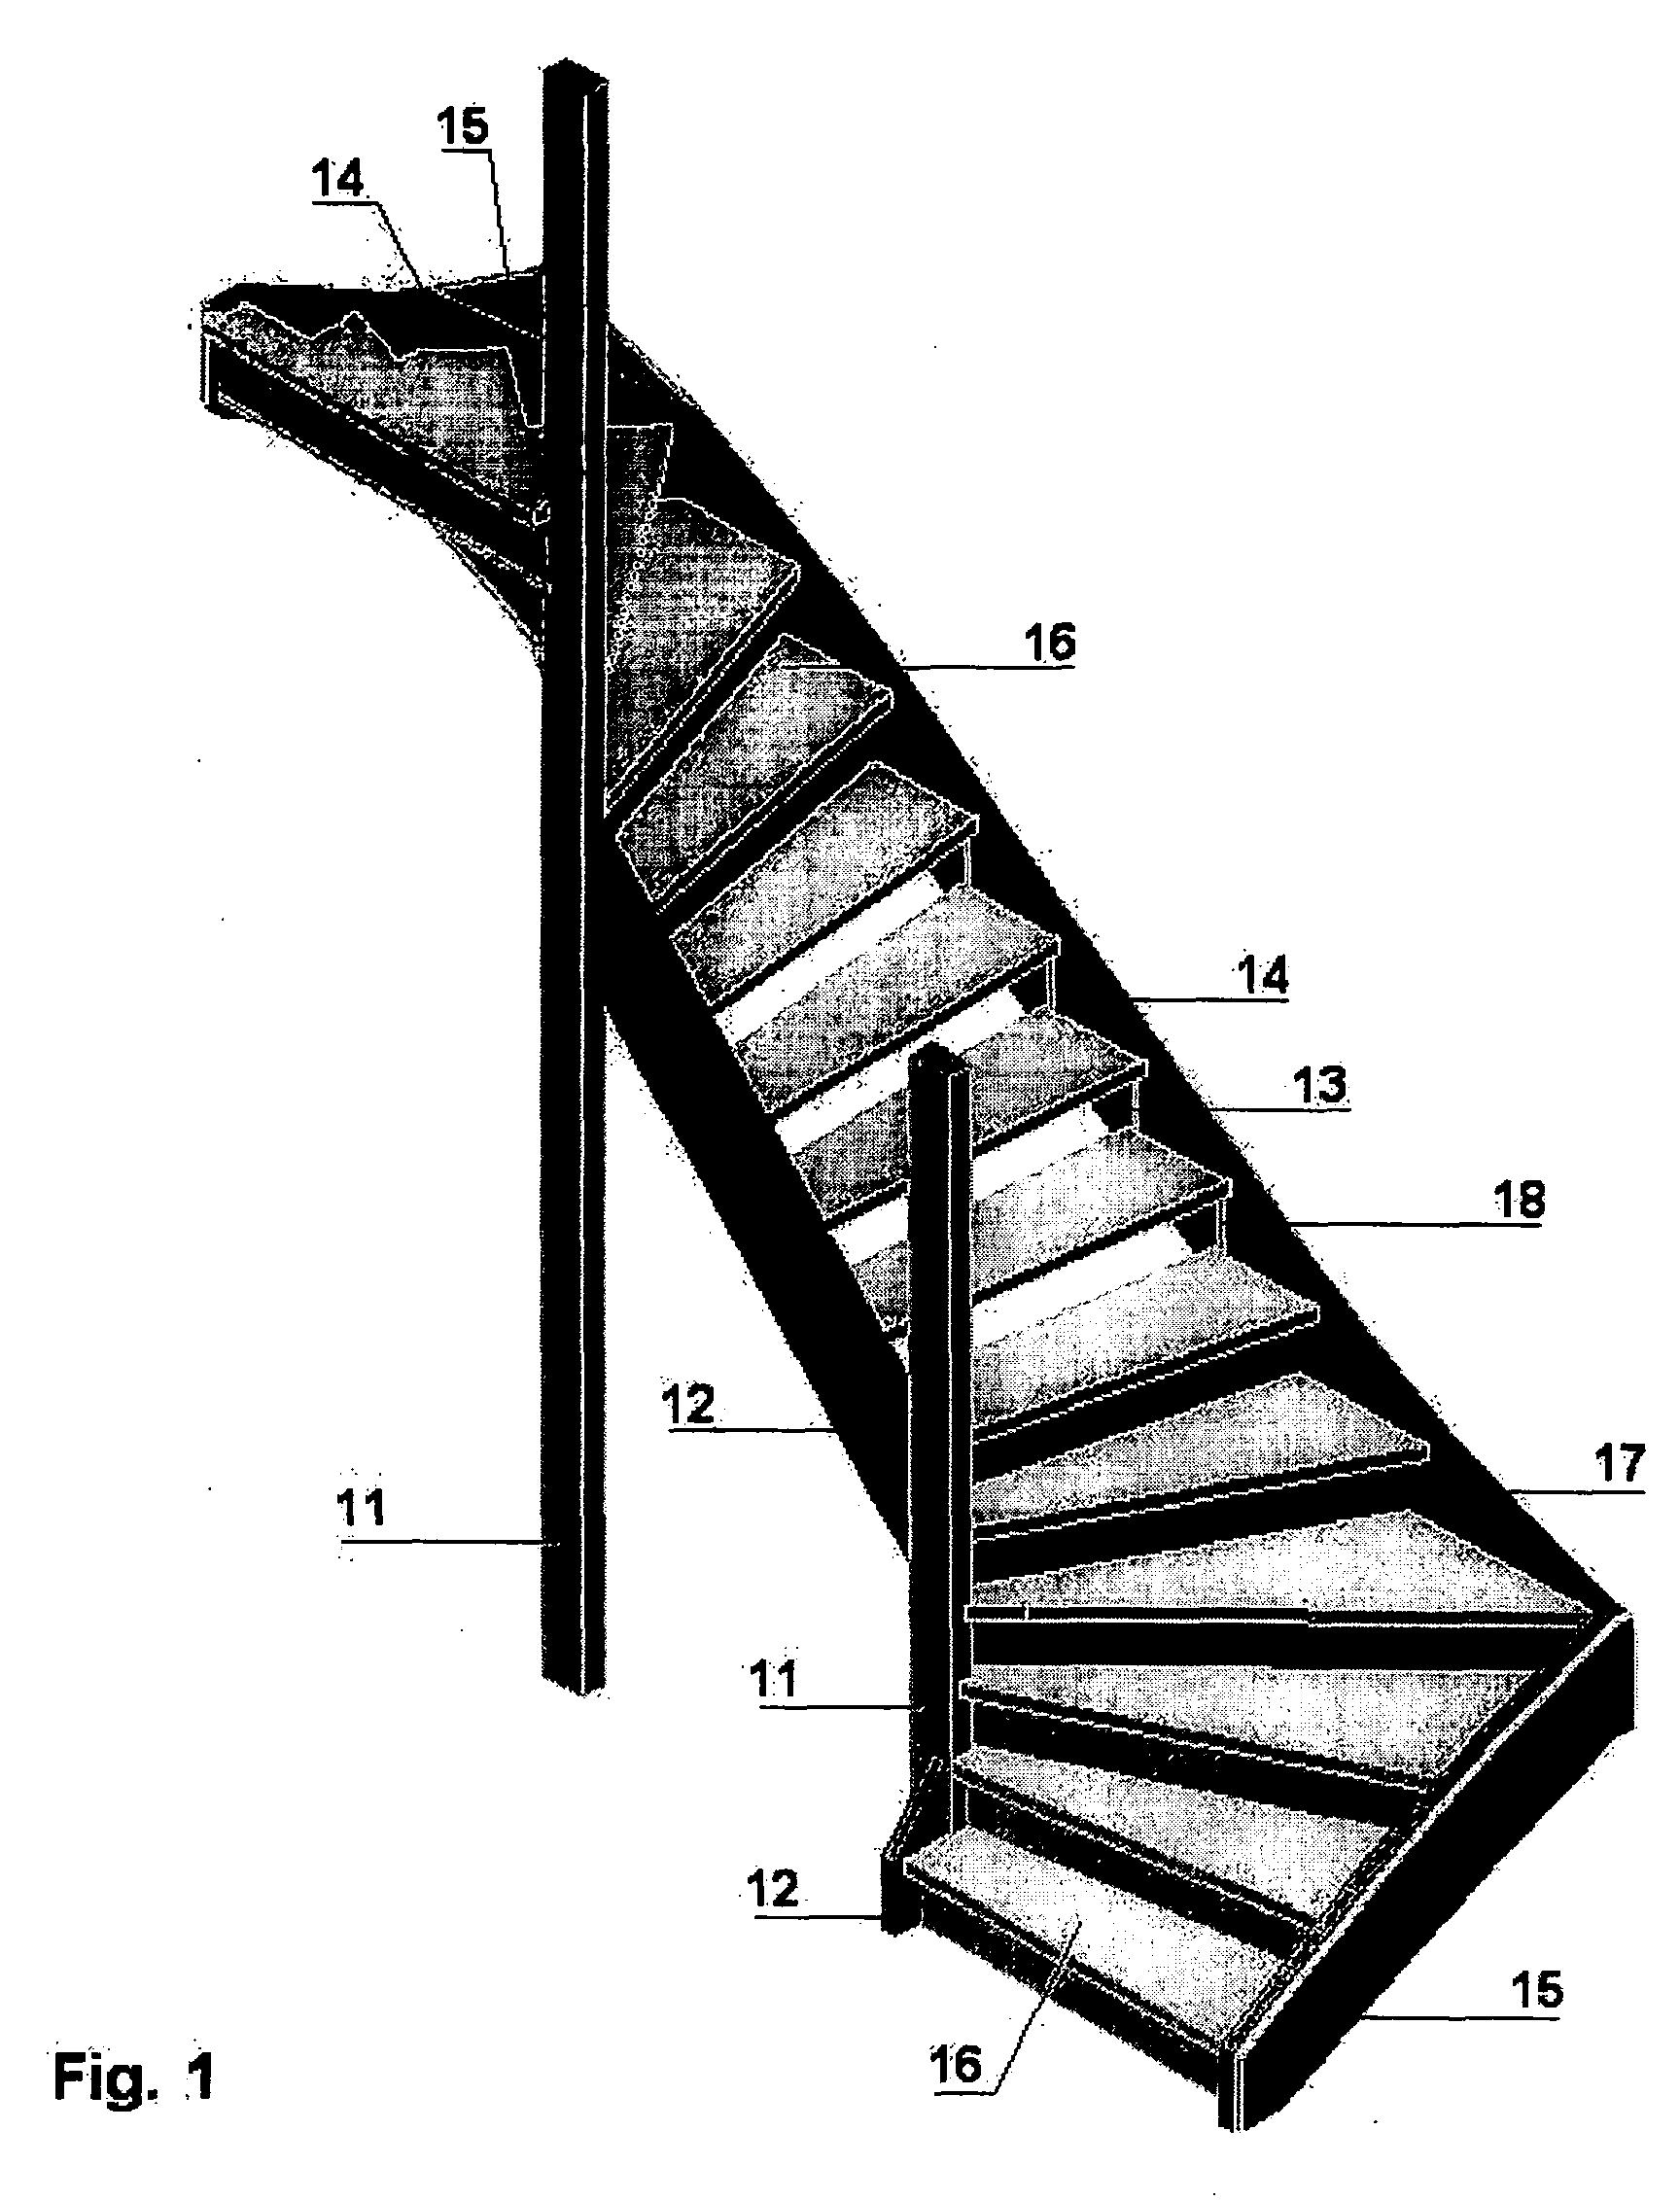 wundersch nen gewendelte treppe konstruieren haus design ideen. Black Bedroom Furniture Sets. Home Design Ideas